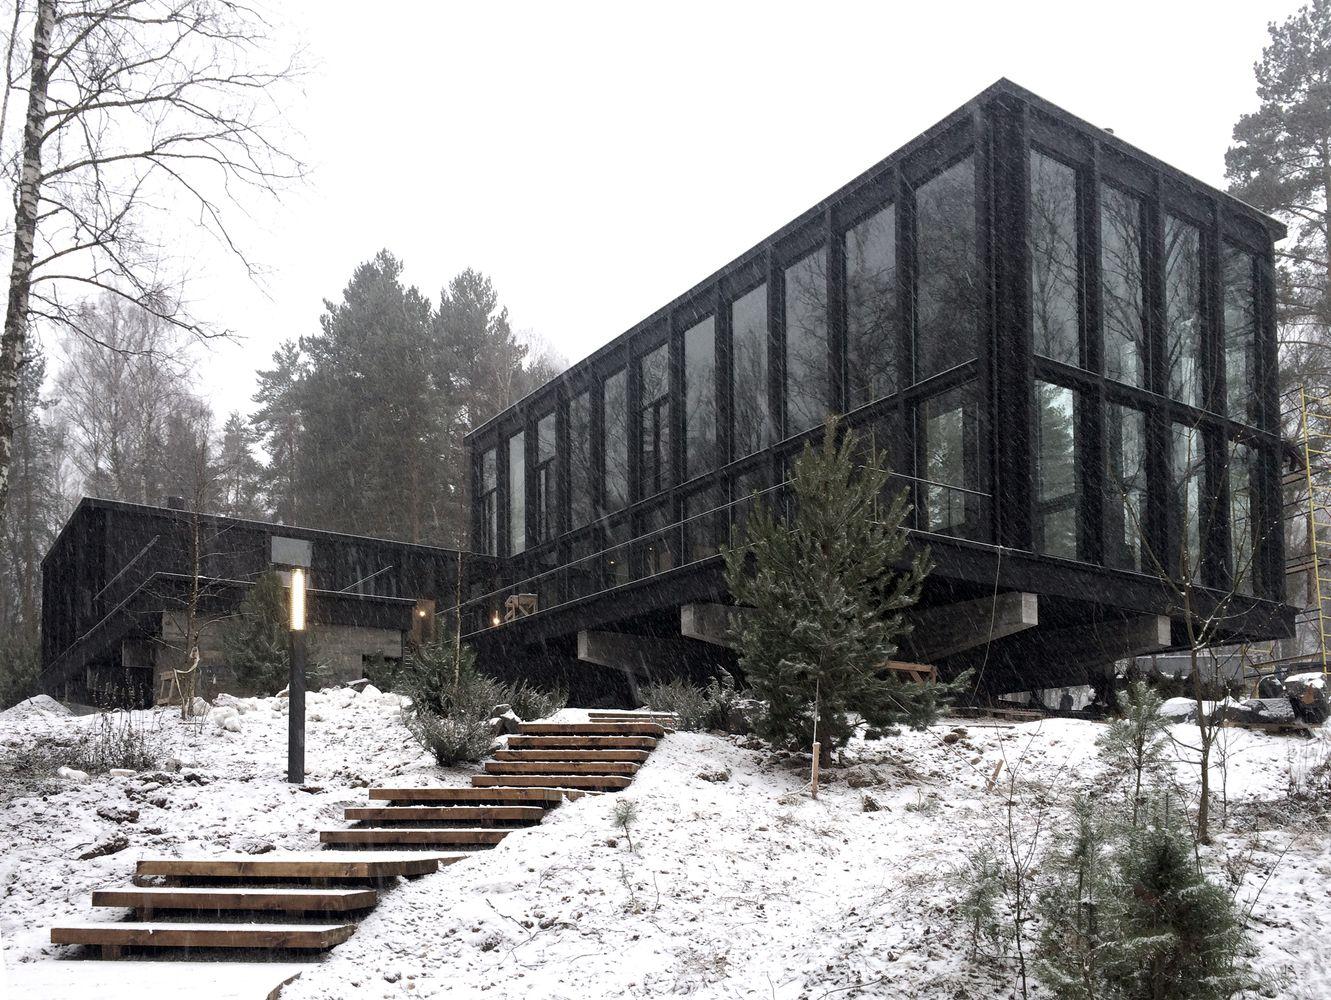 Gallery of guest bath house fas t architectural bureau